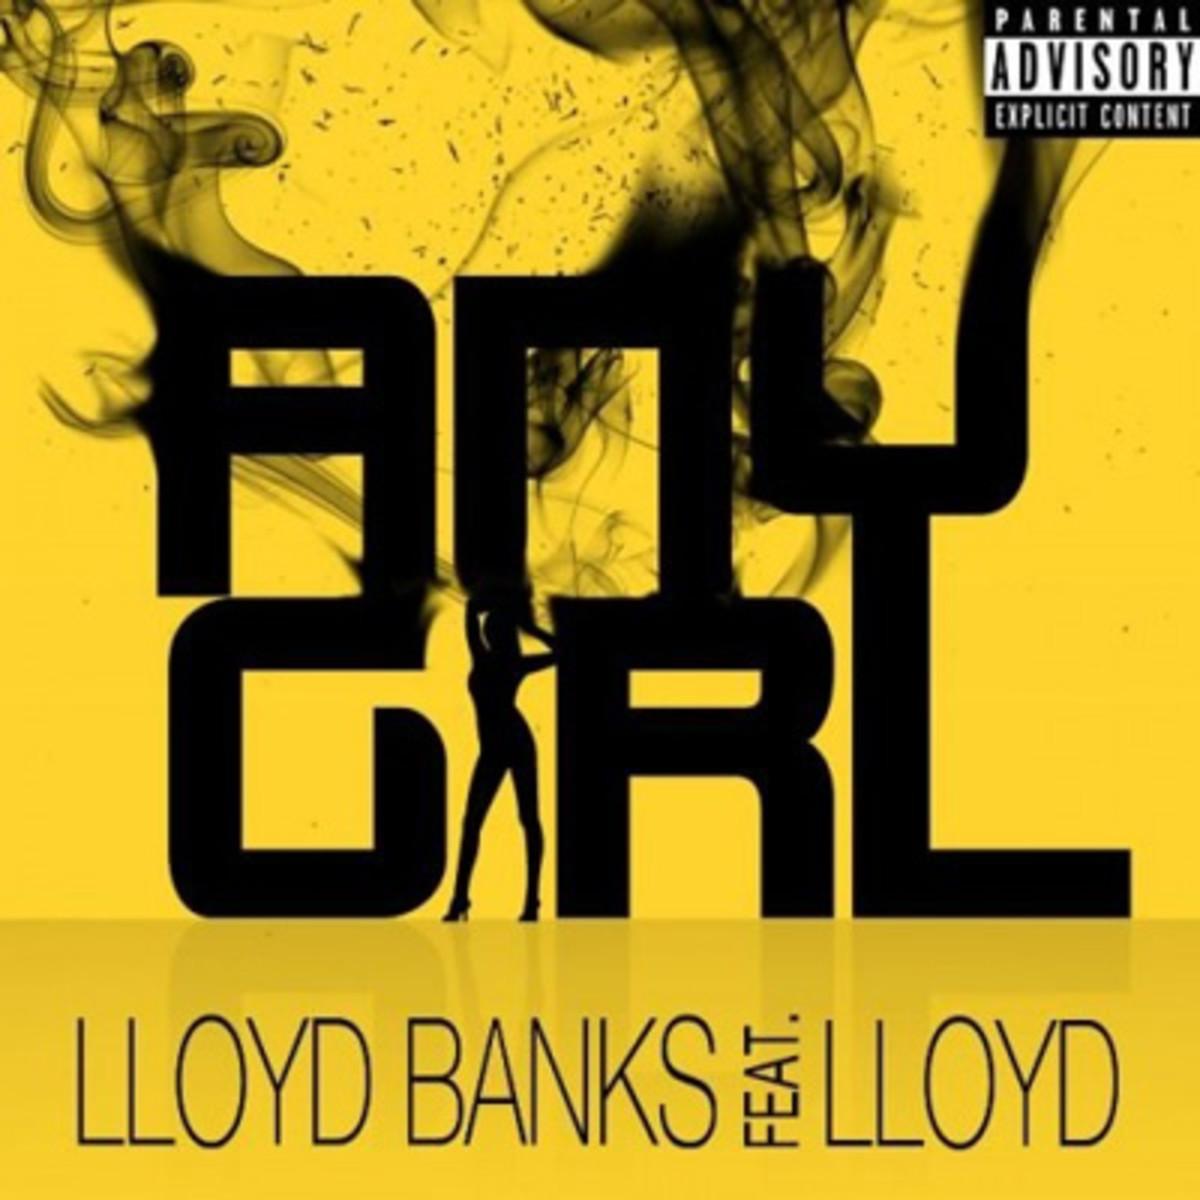 lloydbanks-anygirl.jpg